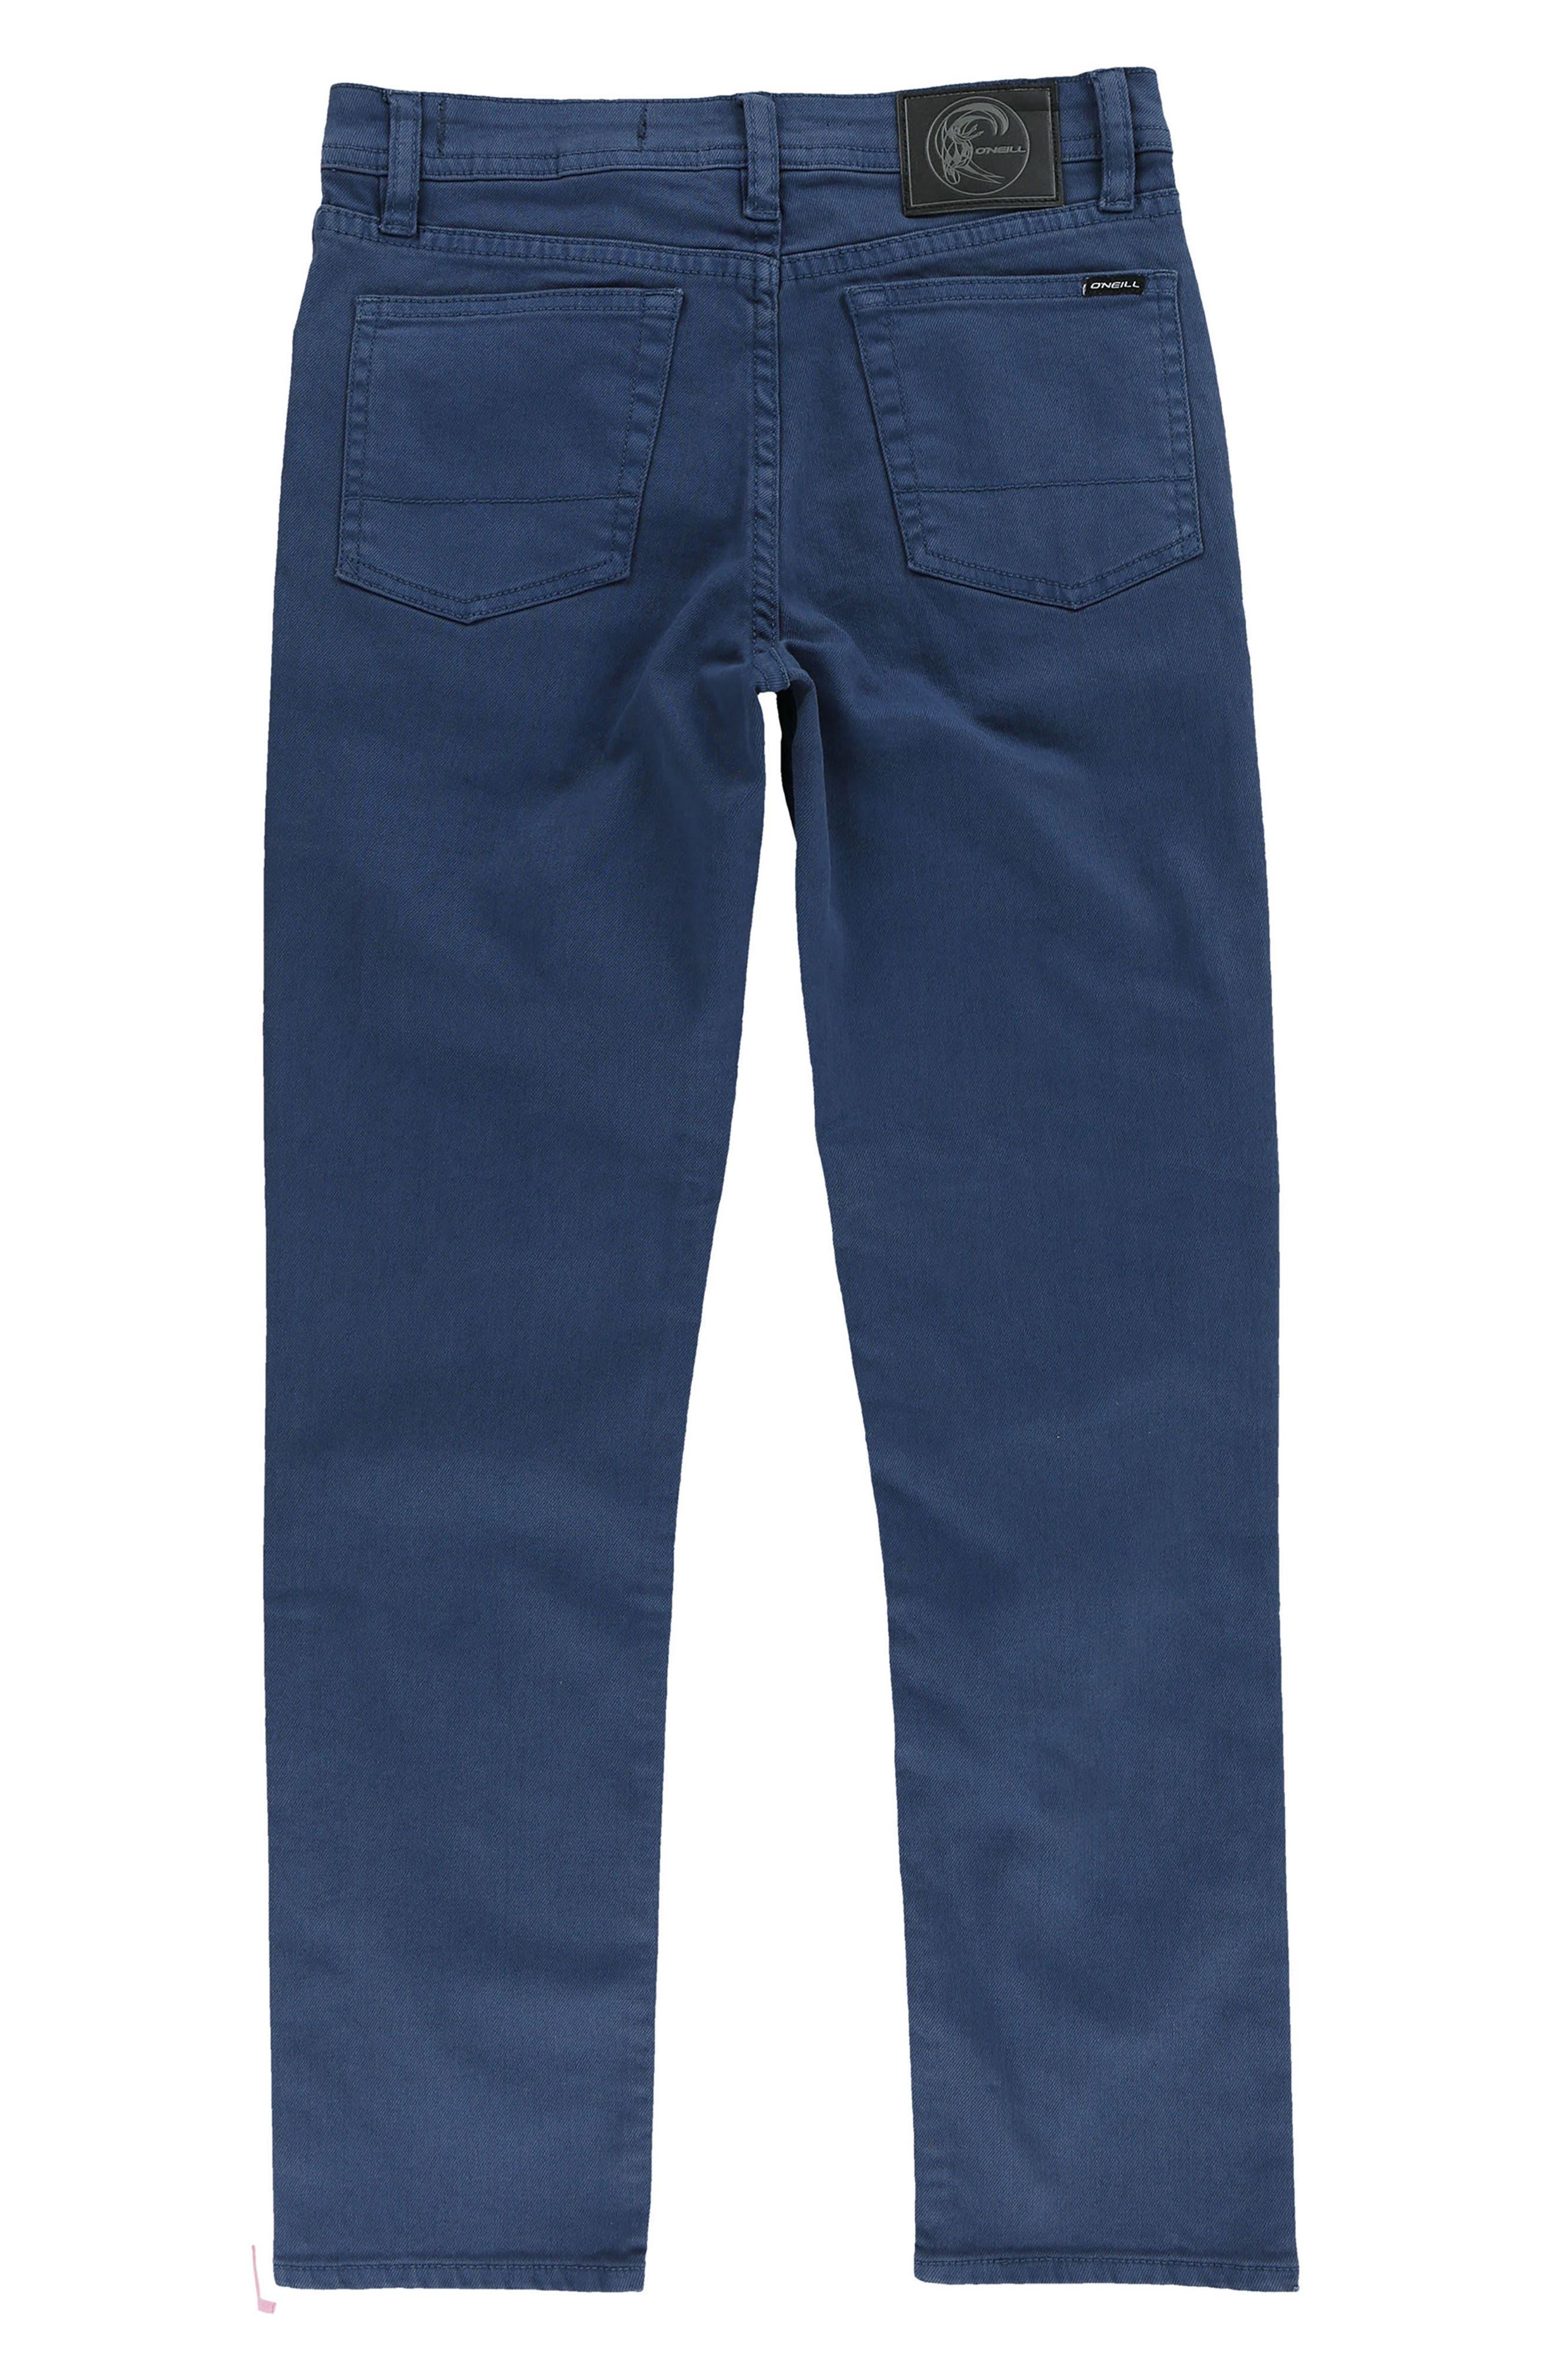 Alternate Image 2  - O'Neill The Slim Twill Pants (Big Boys)